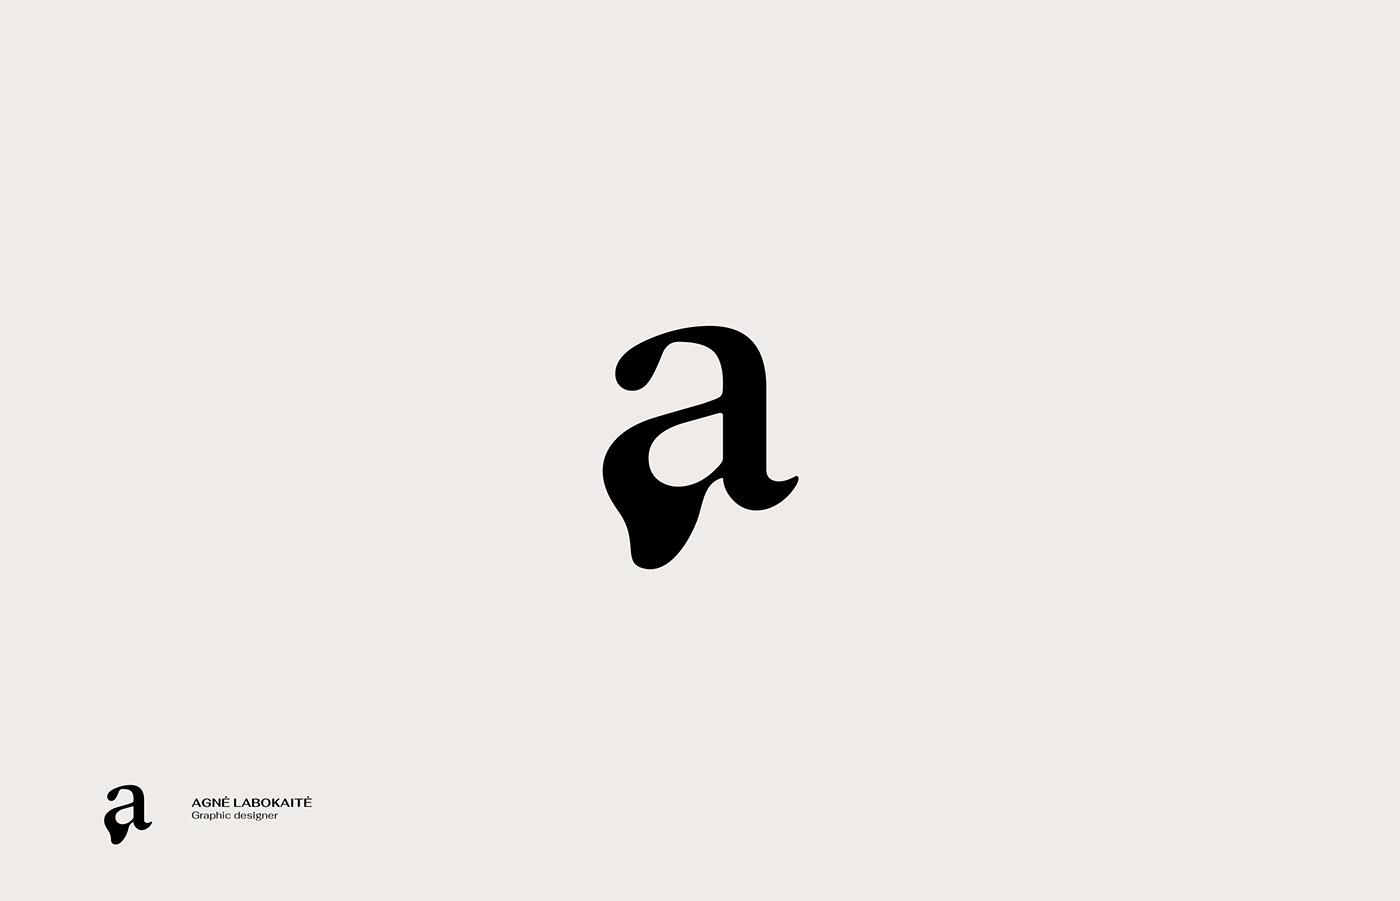 Image may contain: drawing, cartoon and sketch. Logo for graphic designer Agnė Labokaitė.